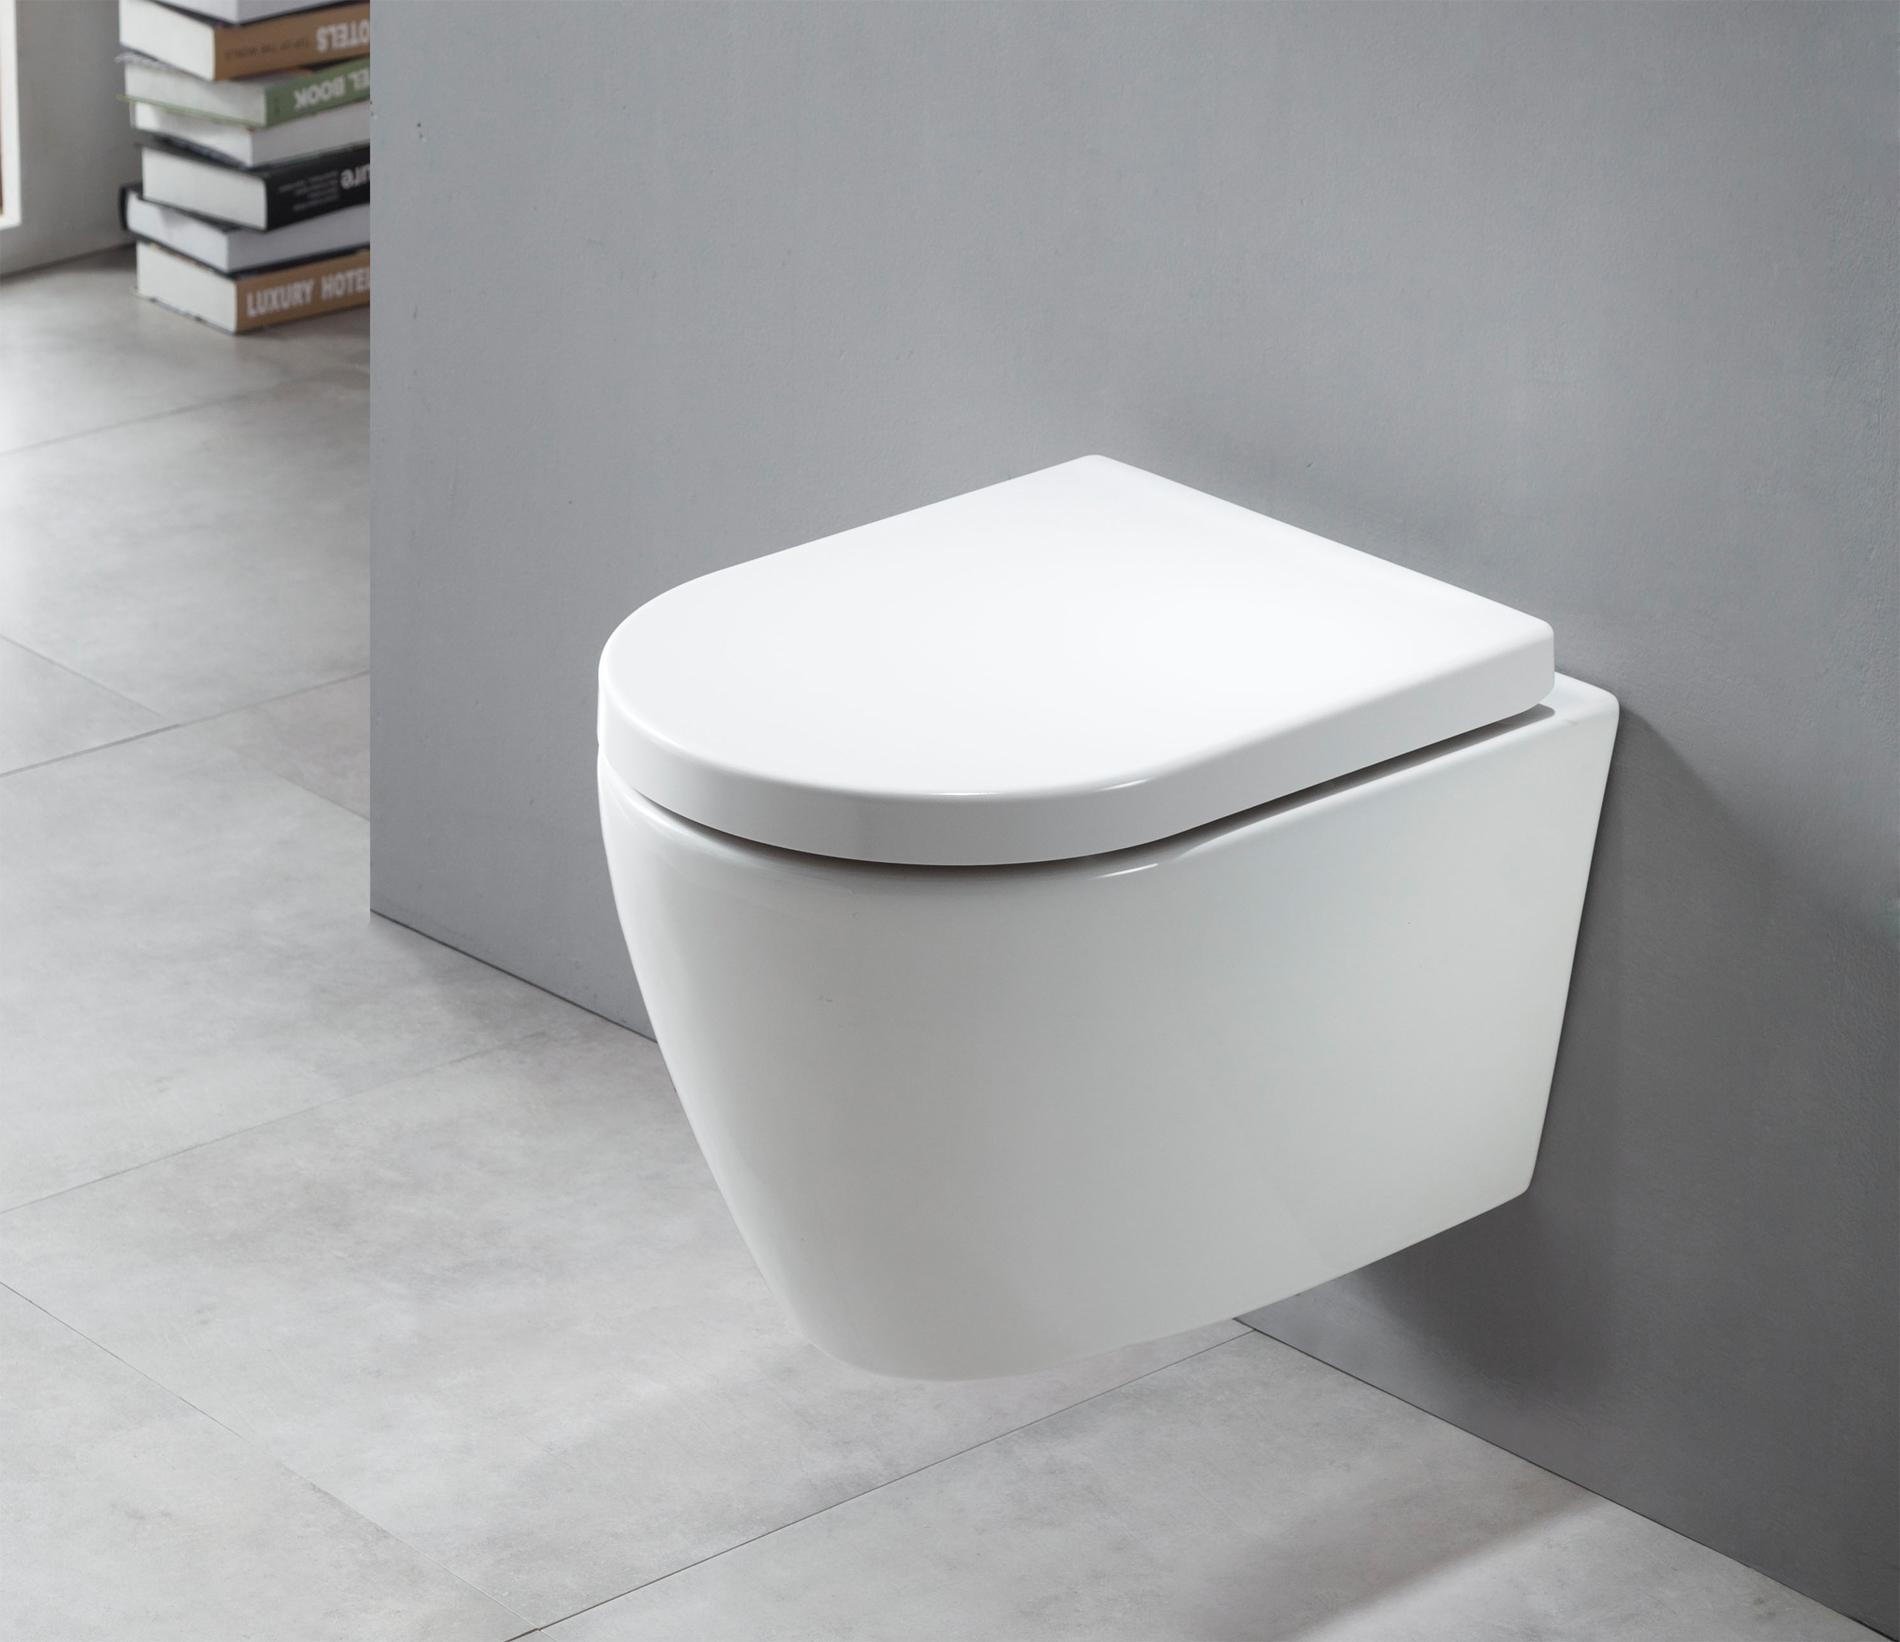 bernstein wand h nge wc b8030 wei softclose deckel toilette ebay. Black Bedroom Furniture Sets. Home Design Ideas